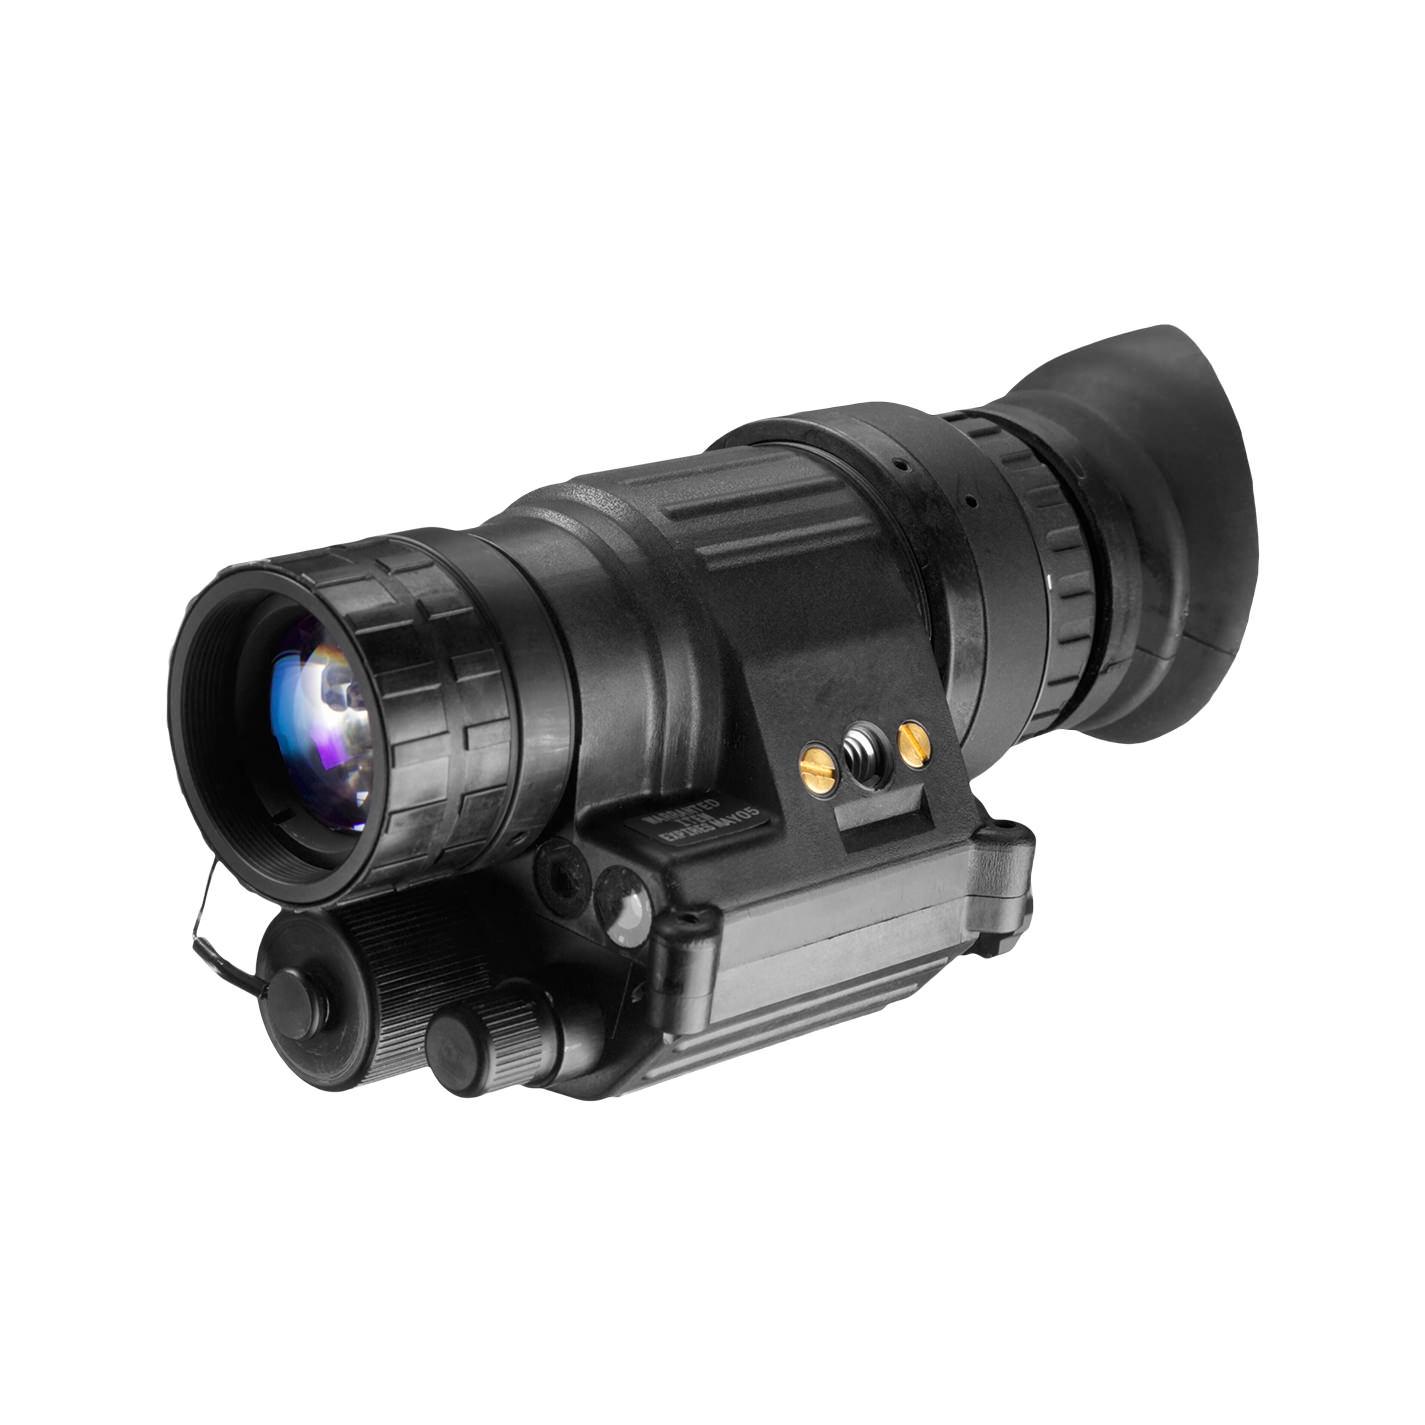 Elbit Systems of America Mil Spec AN/PVS-14 Night Vision Monocular